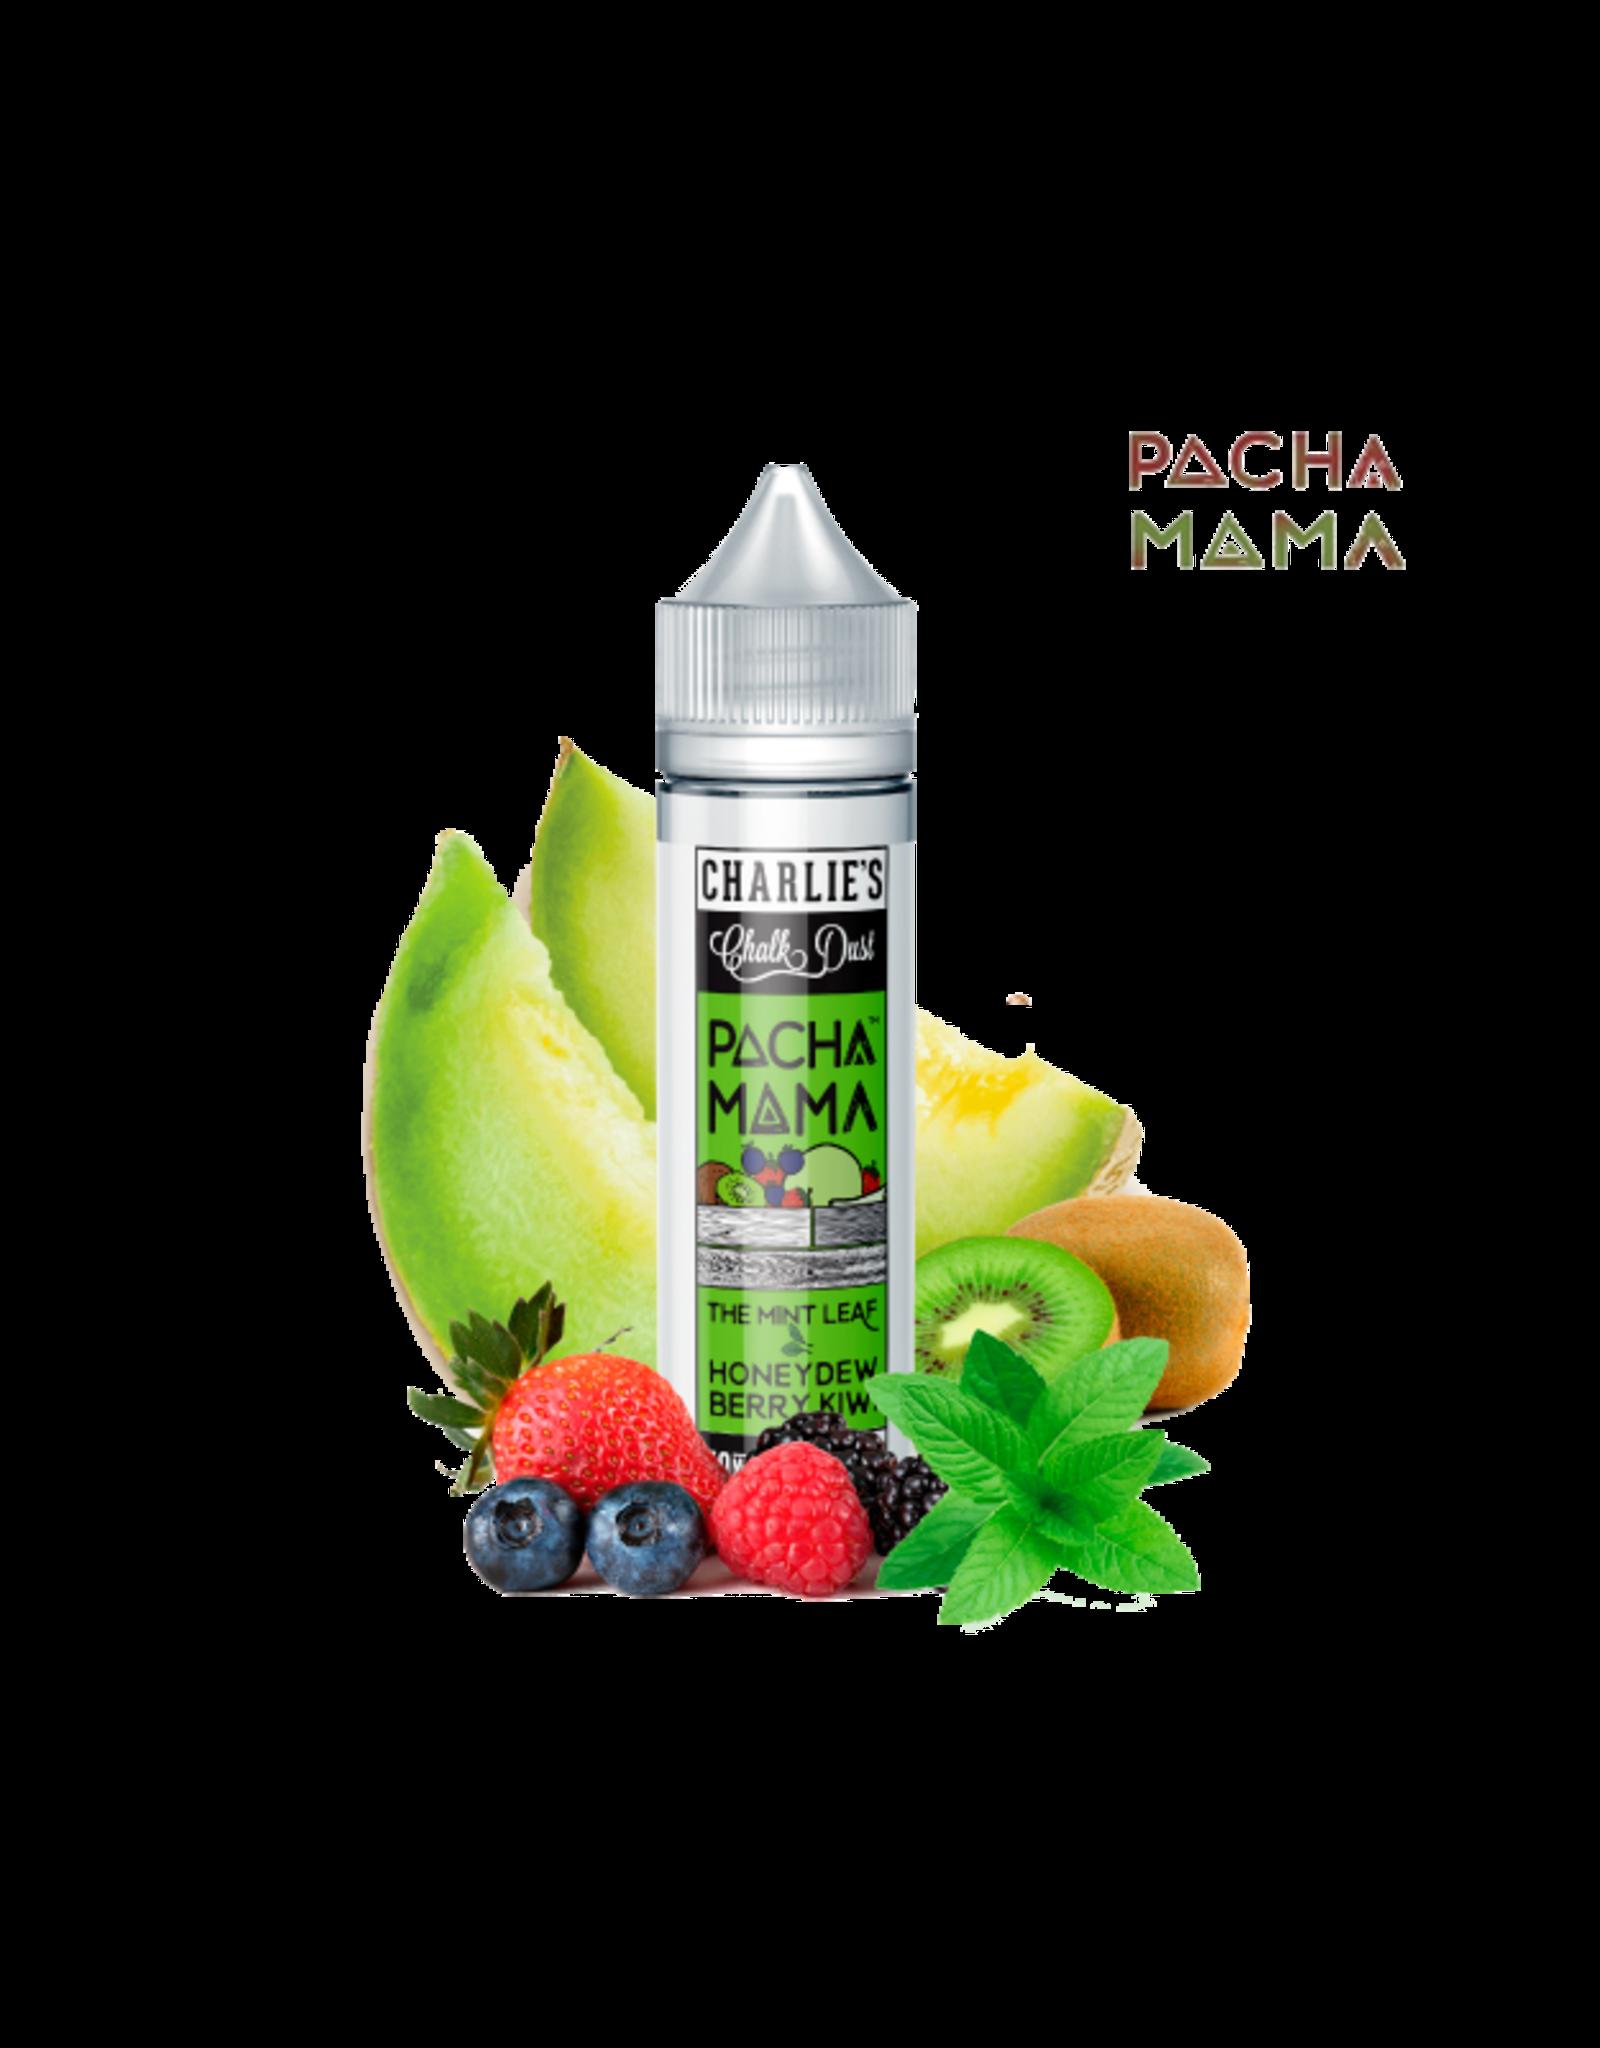 Pacha Mama Pacha Mama - The Mint Leaf  50ml